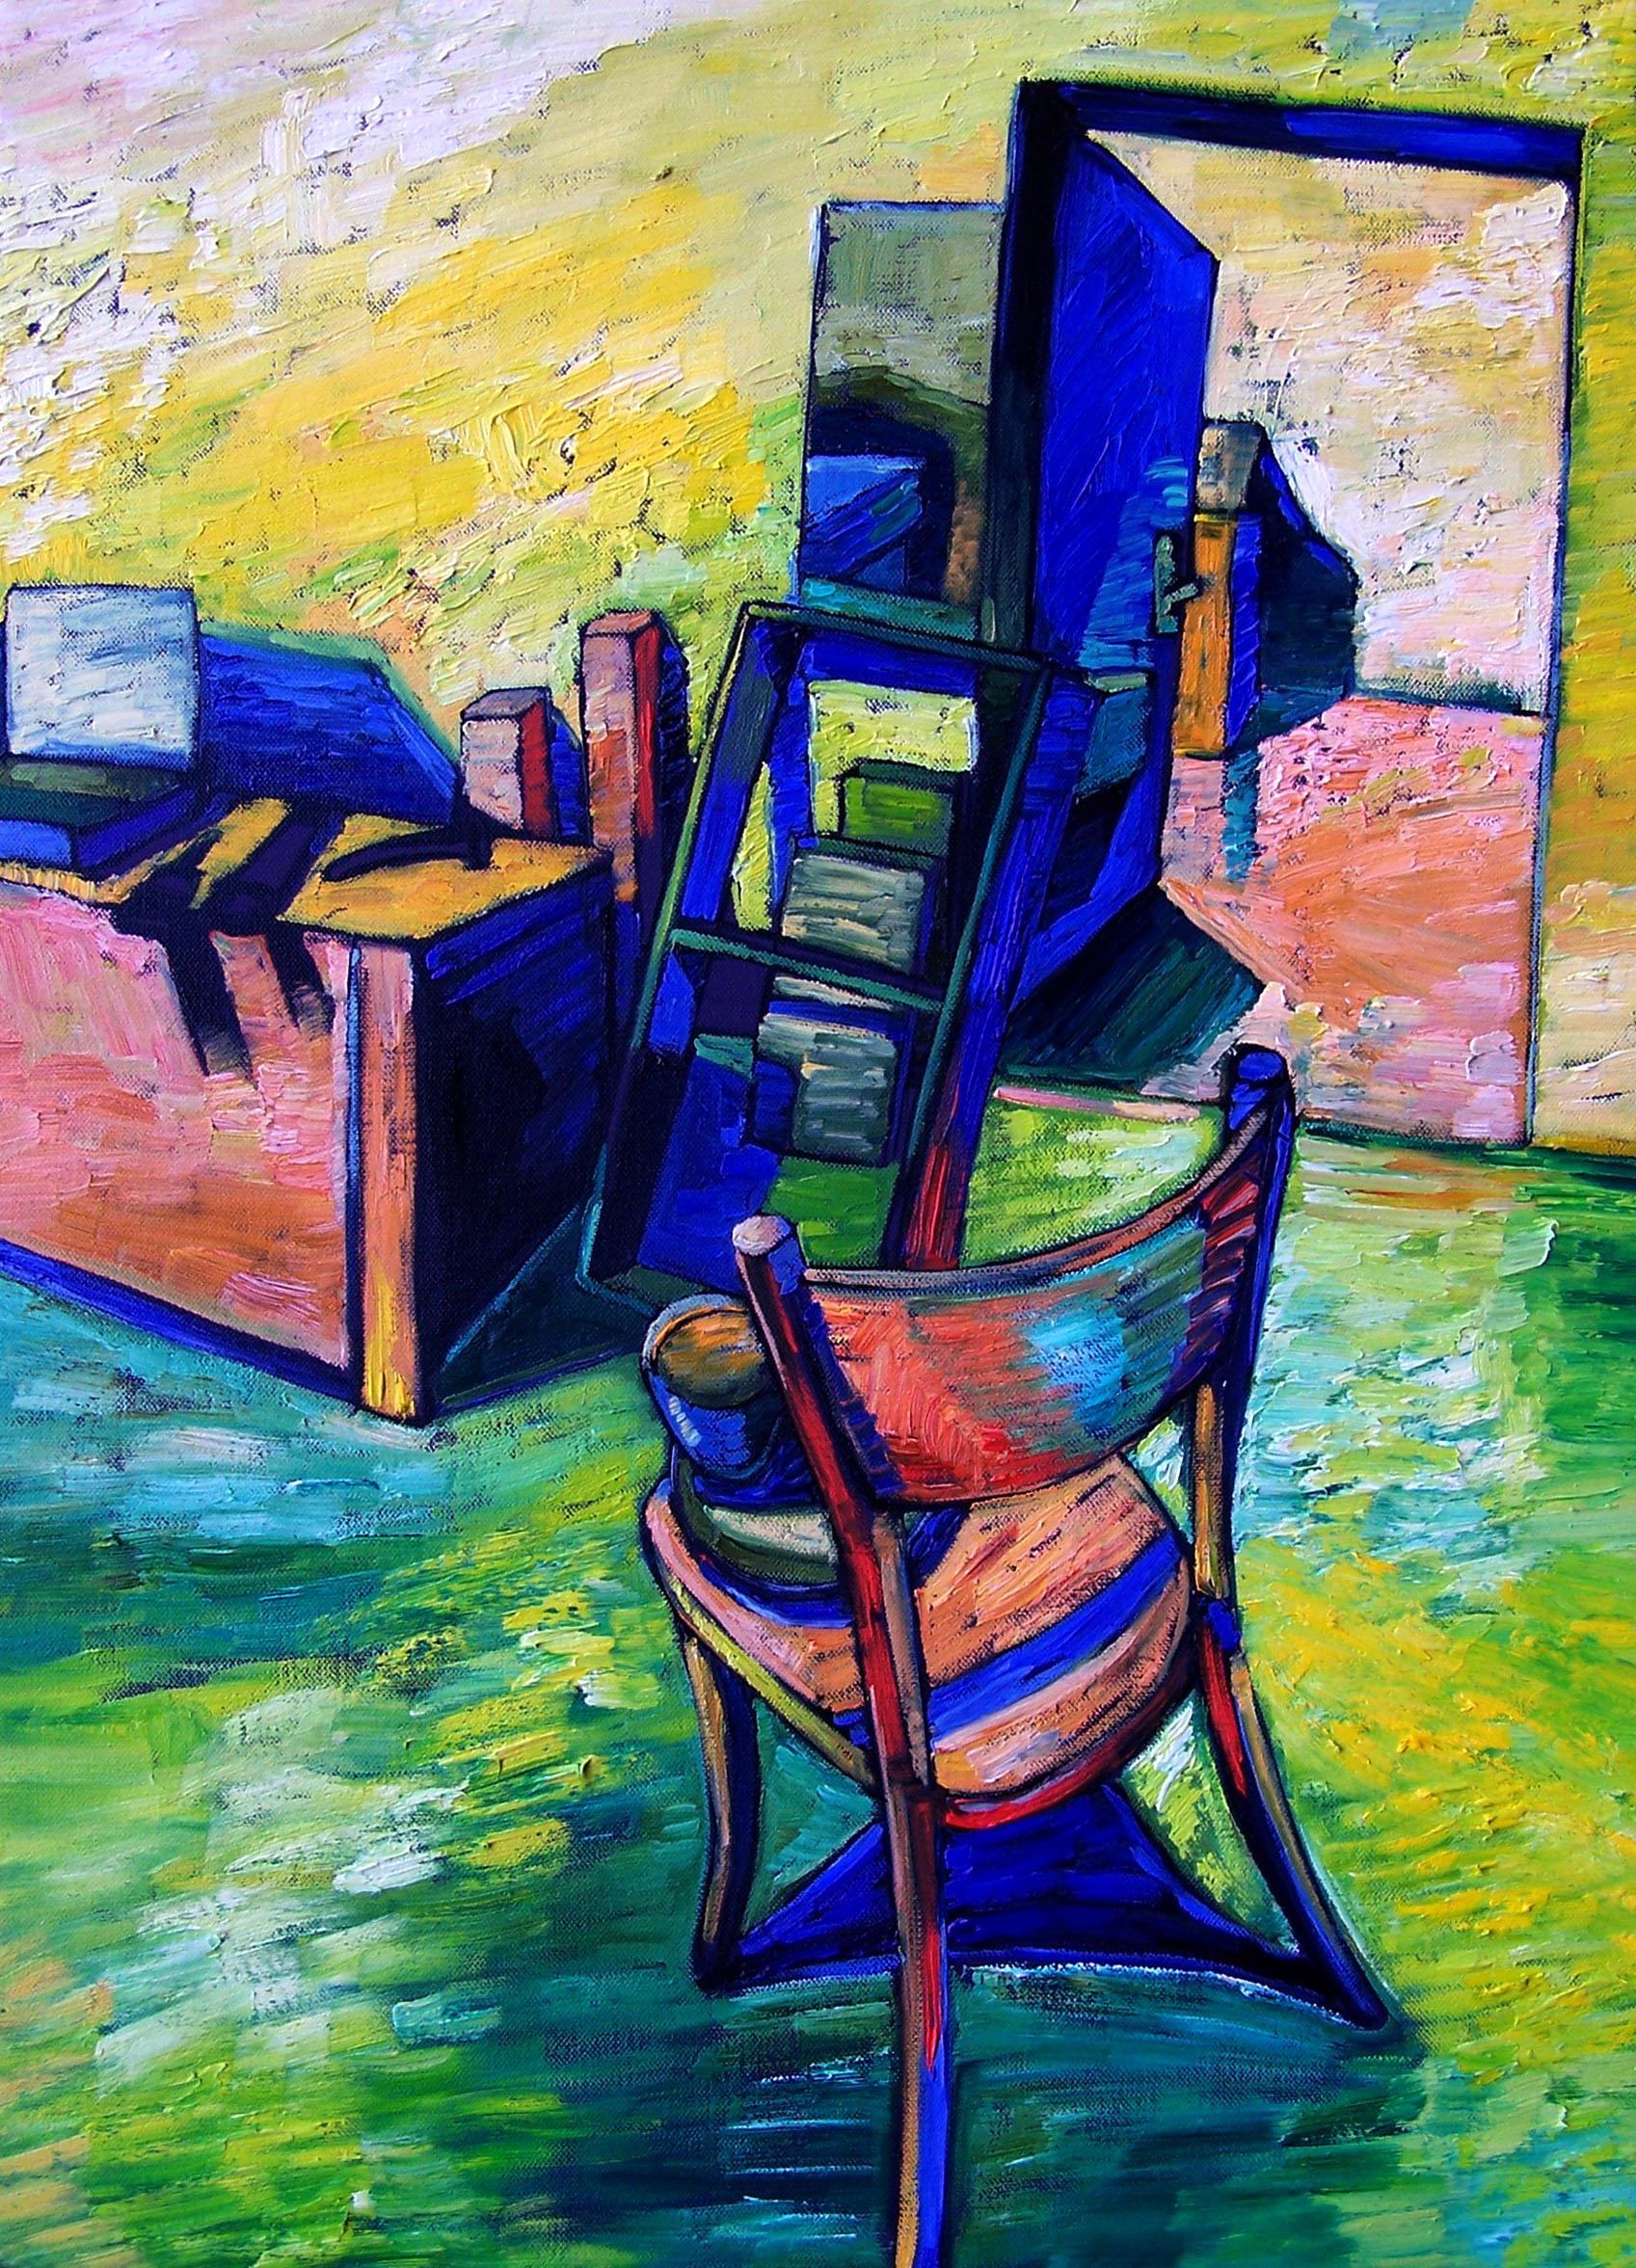 Papageorgiu, Andrea: In the studio I.